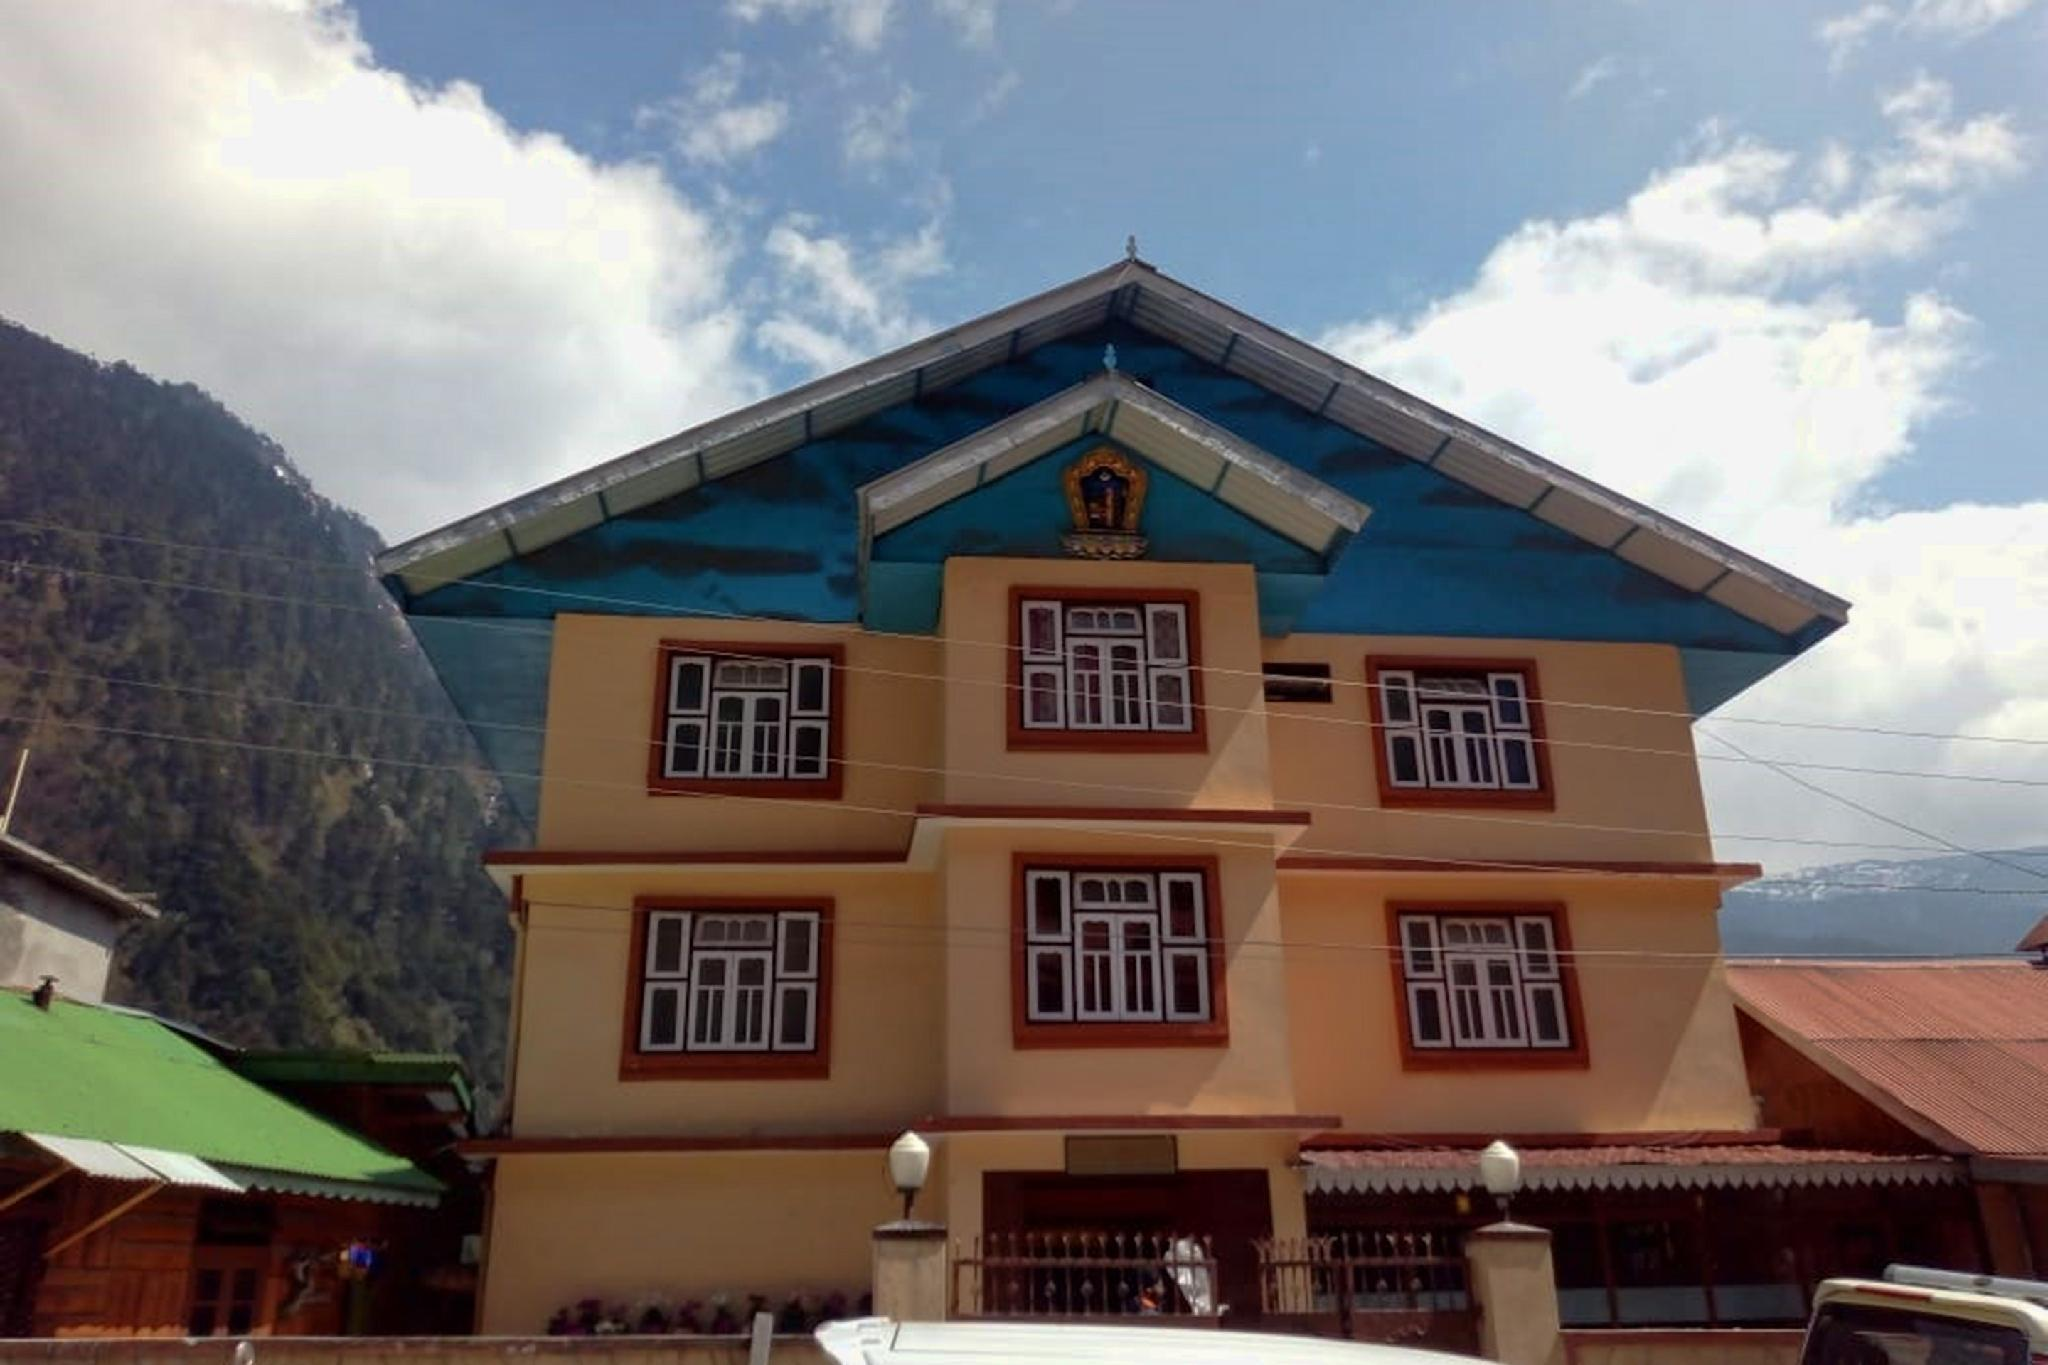 OYO 37746 Hotel Norling Zimkhang